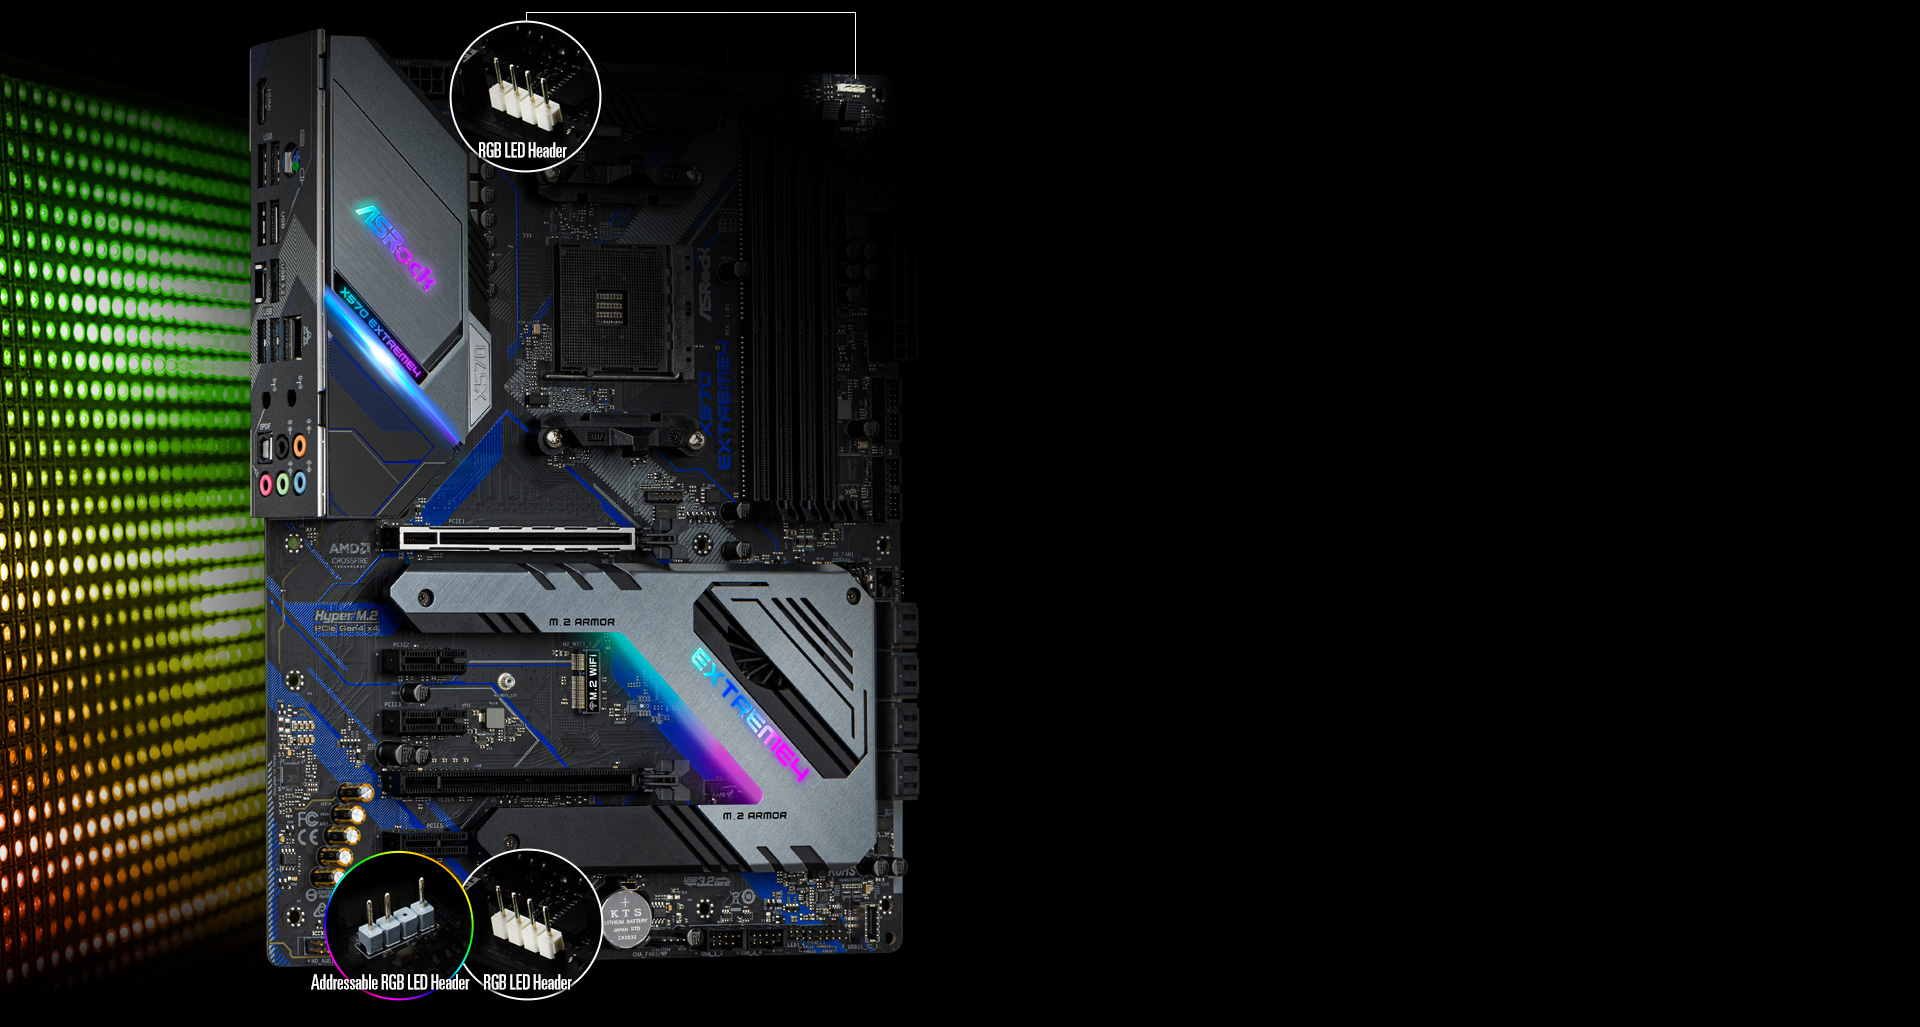 ASRock X570 EXTREME4 AM4 ATX AMD Motherboard - Newegg com